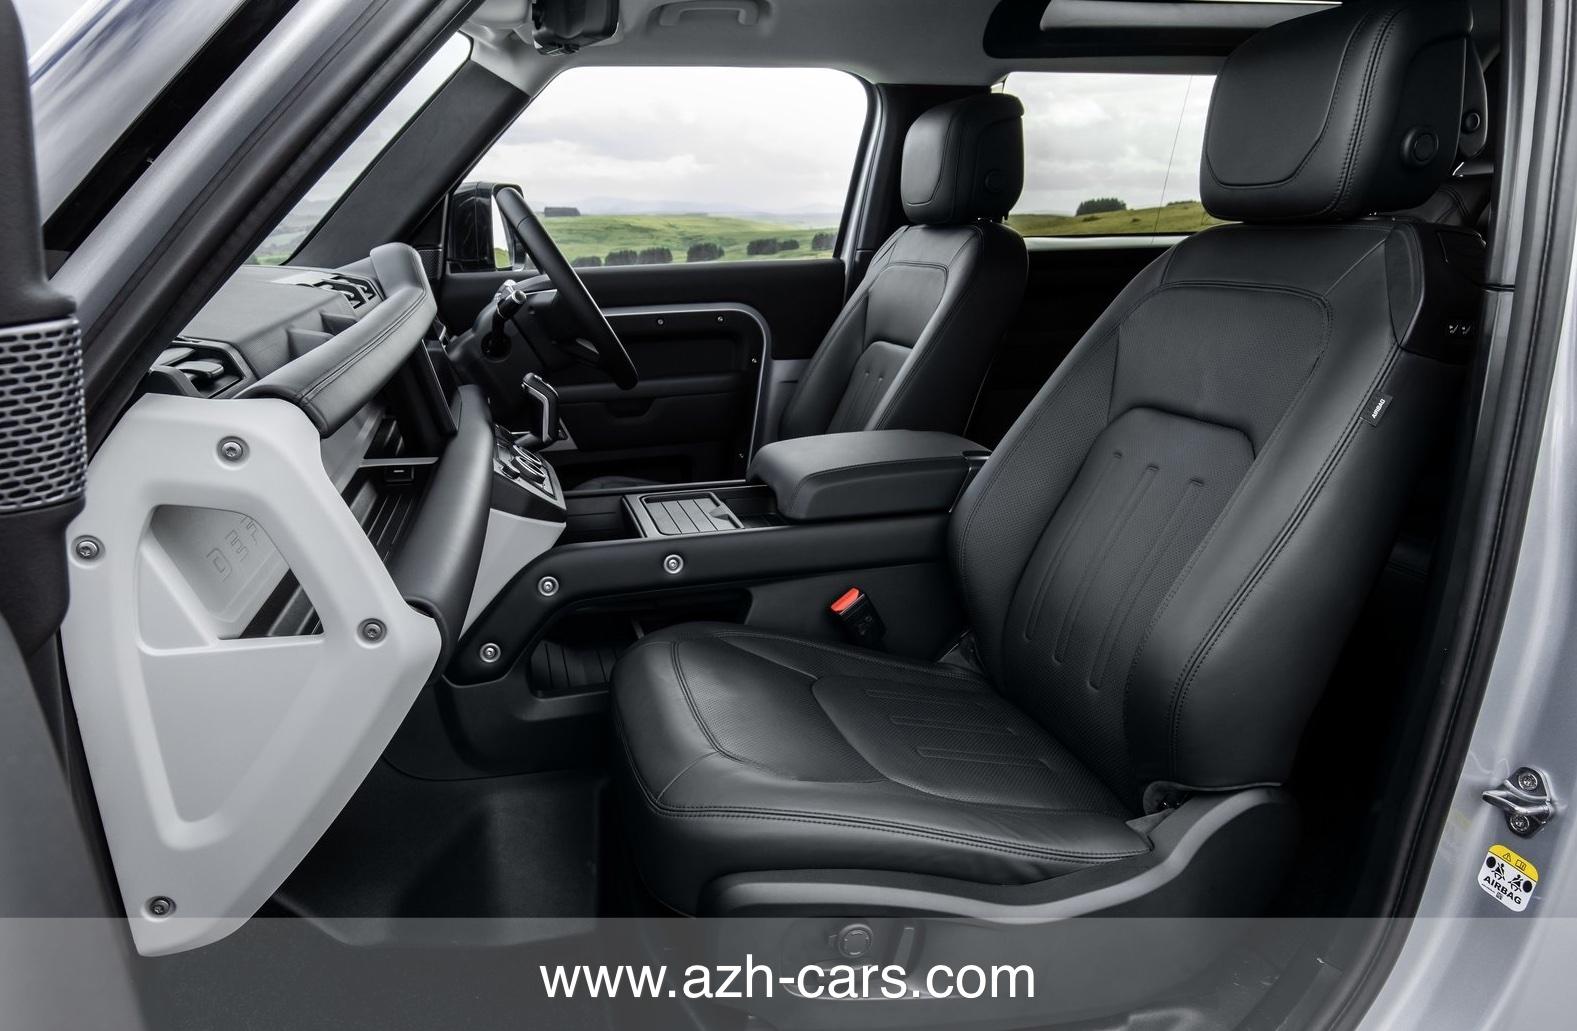 2021 Land Rover Defender 90 - AZH-CARS